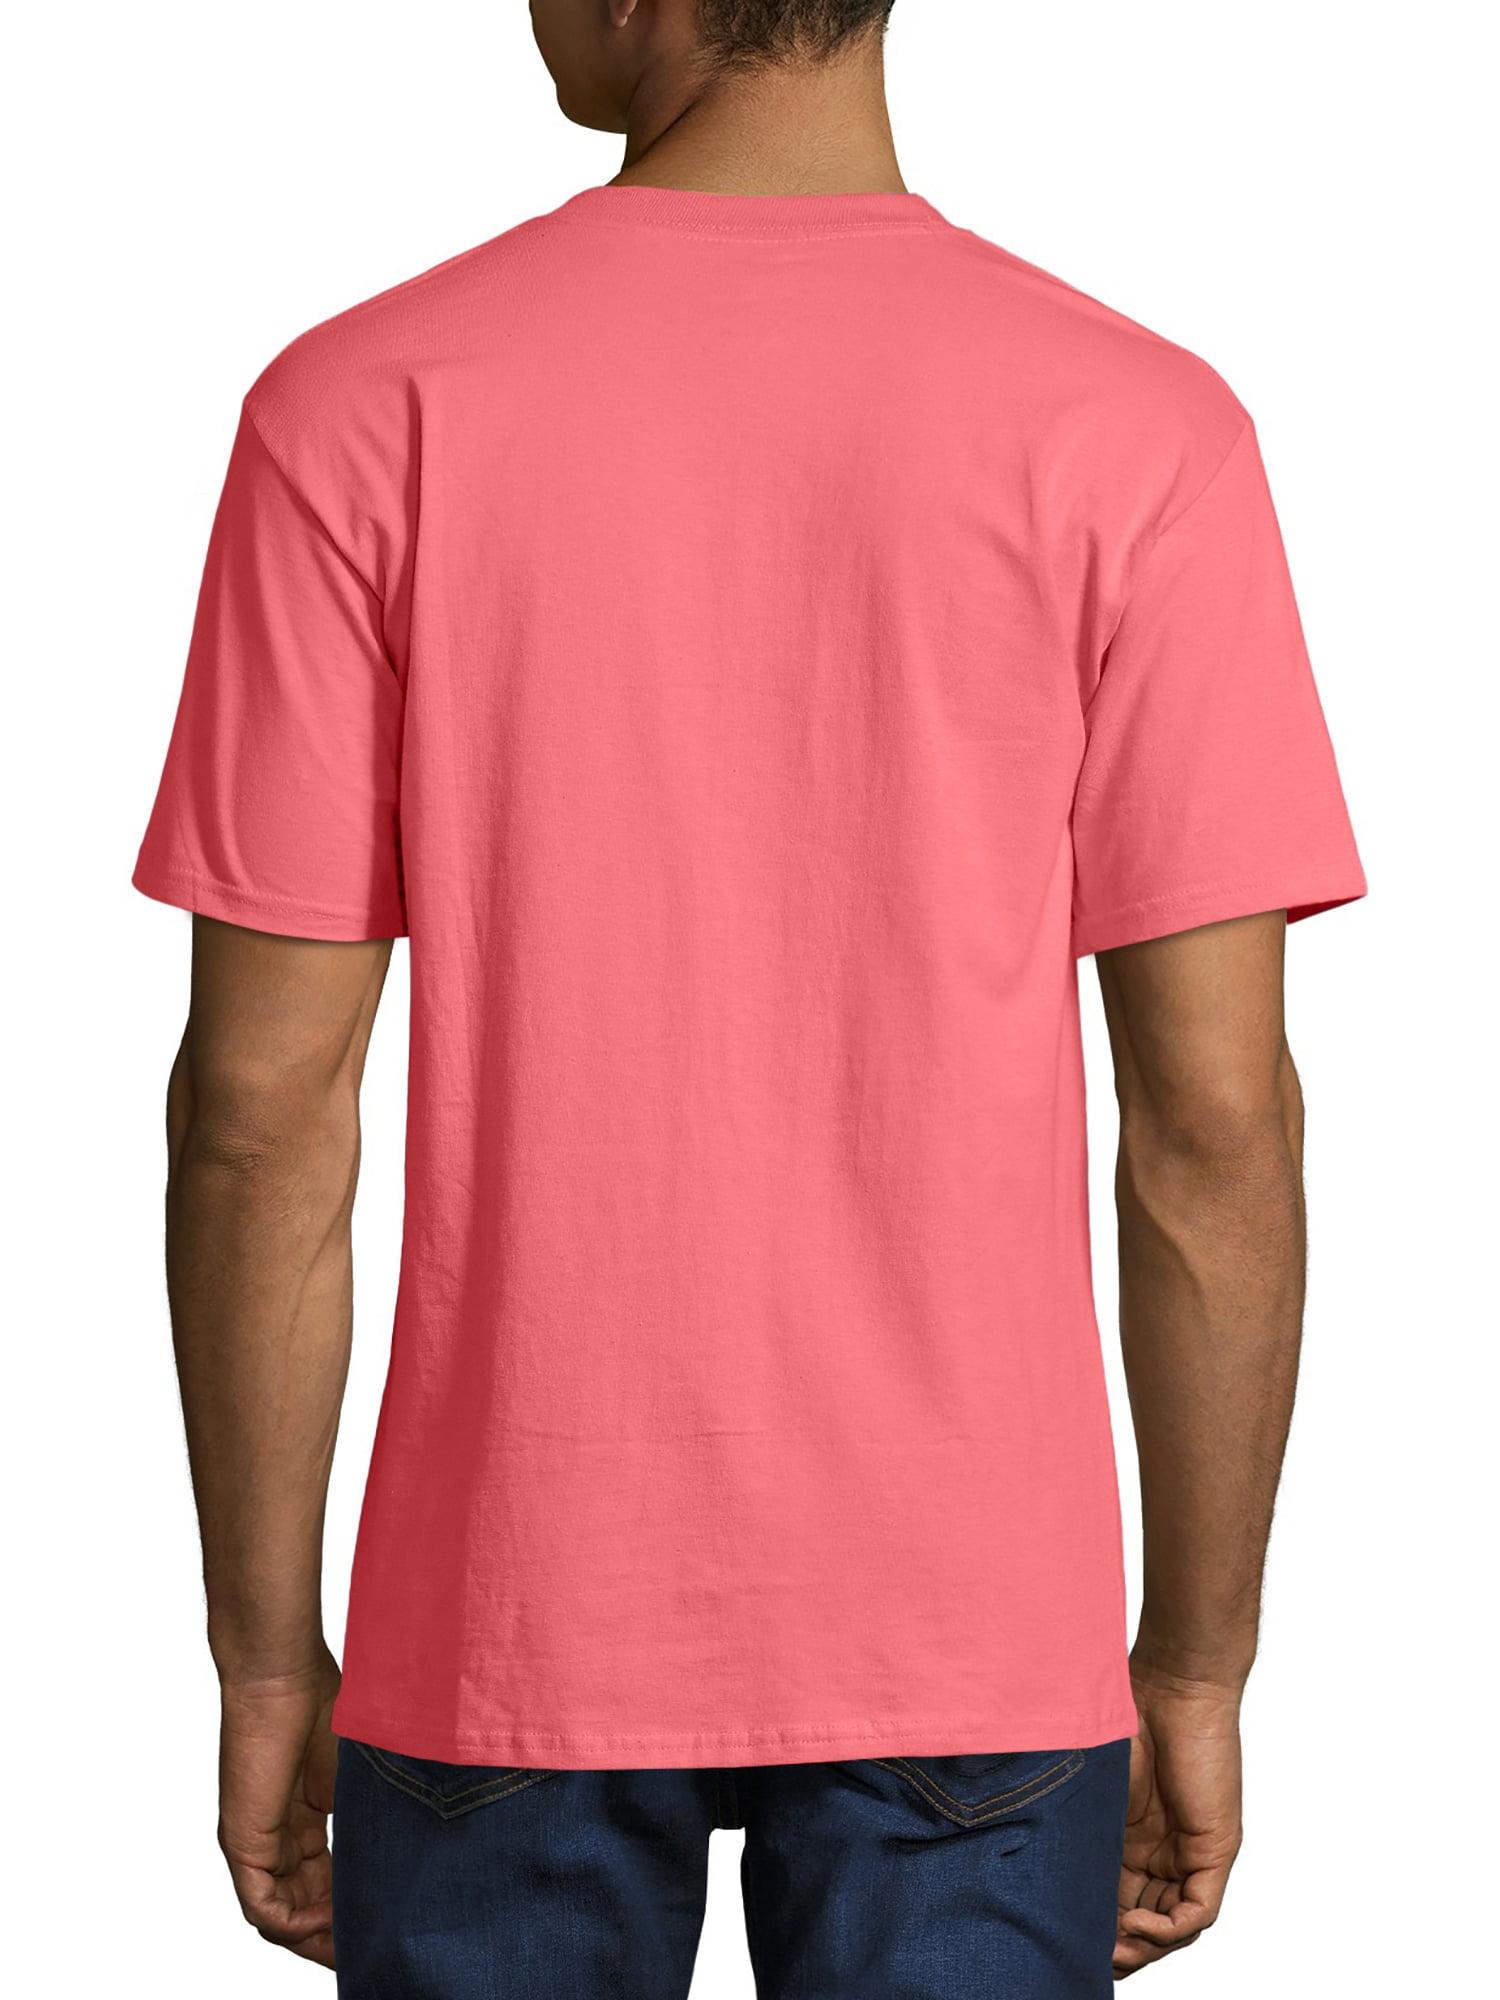 98e77602a Hanes - Hanes Men's Beefy-T Crew Neck Short Sleeve T-Shirt, up to 6xl -  Walmart.com